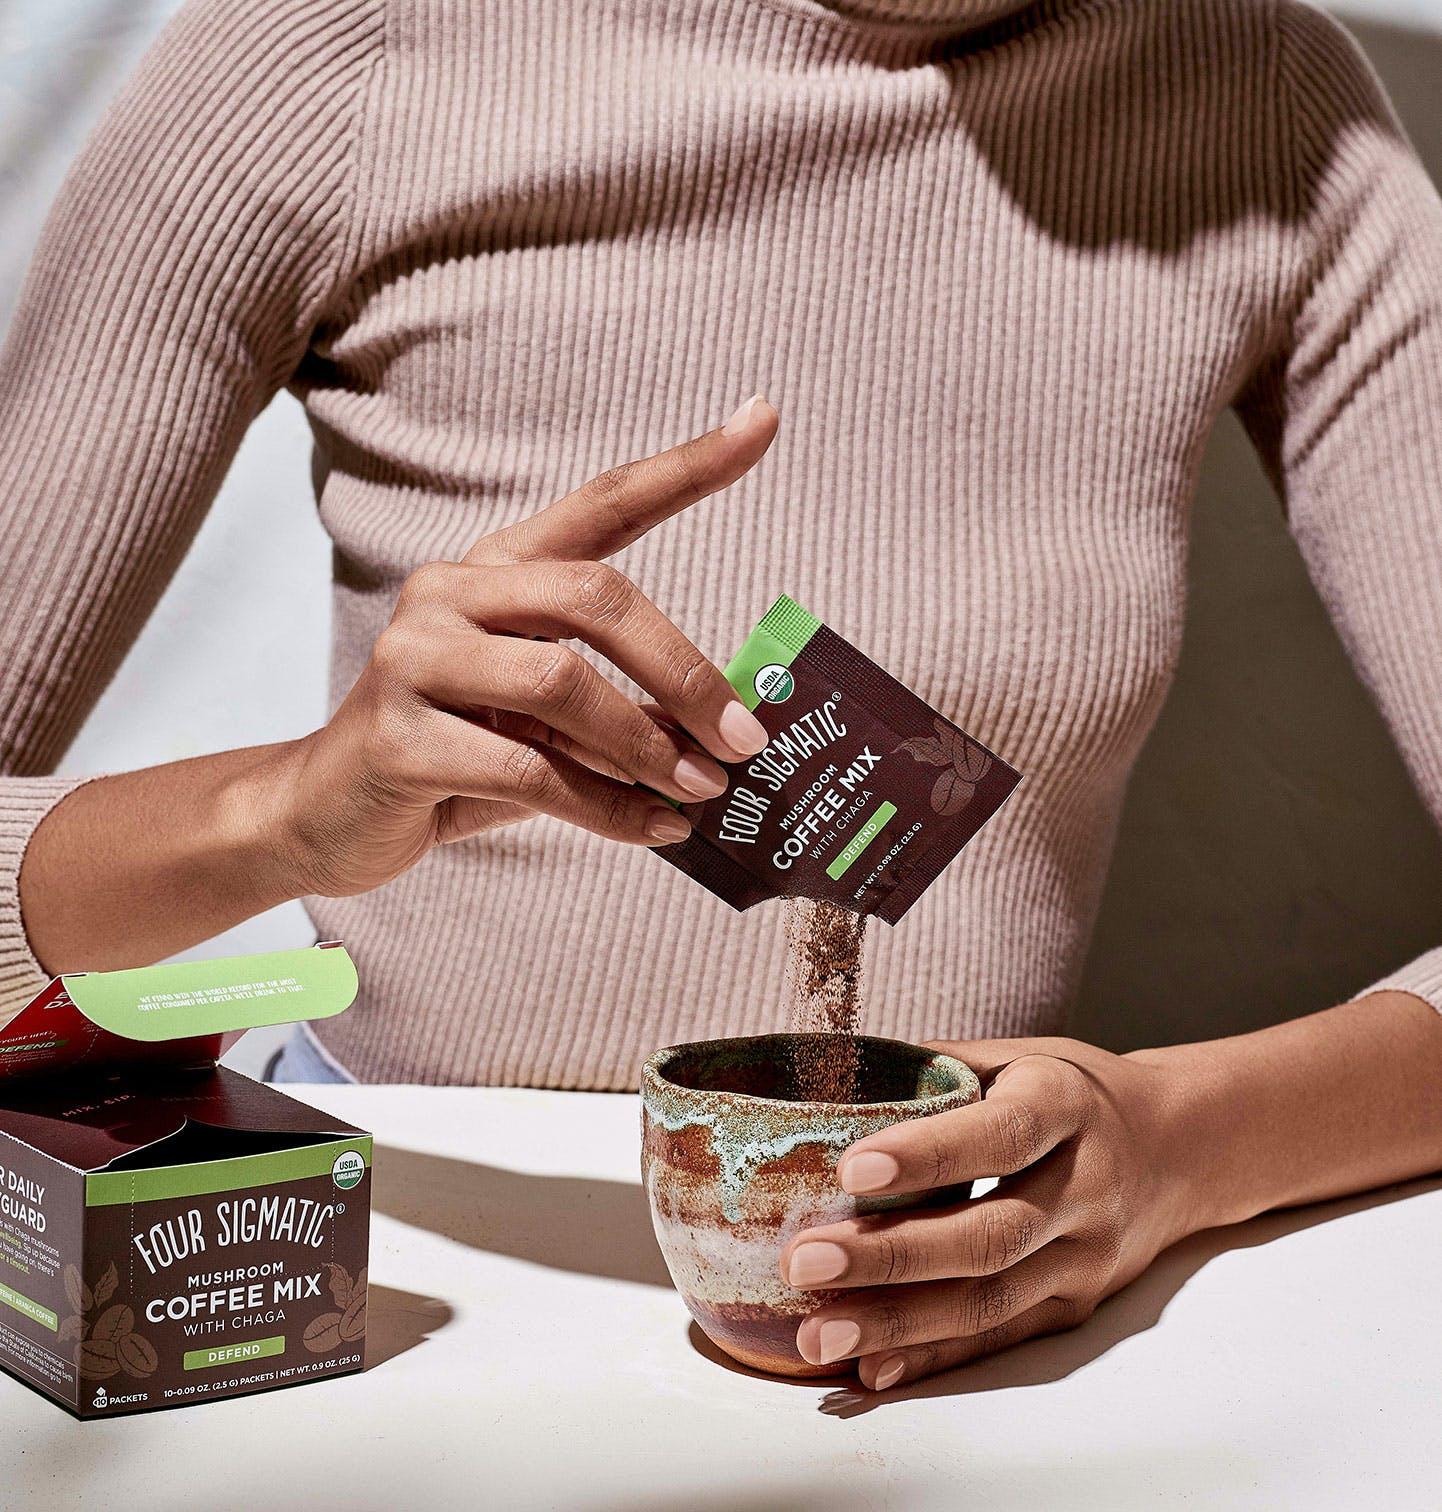 Mushroom Coffee with Chaga Instant